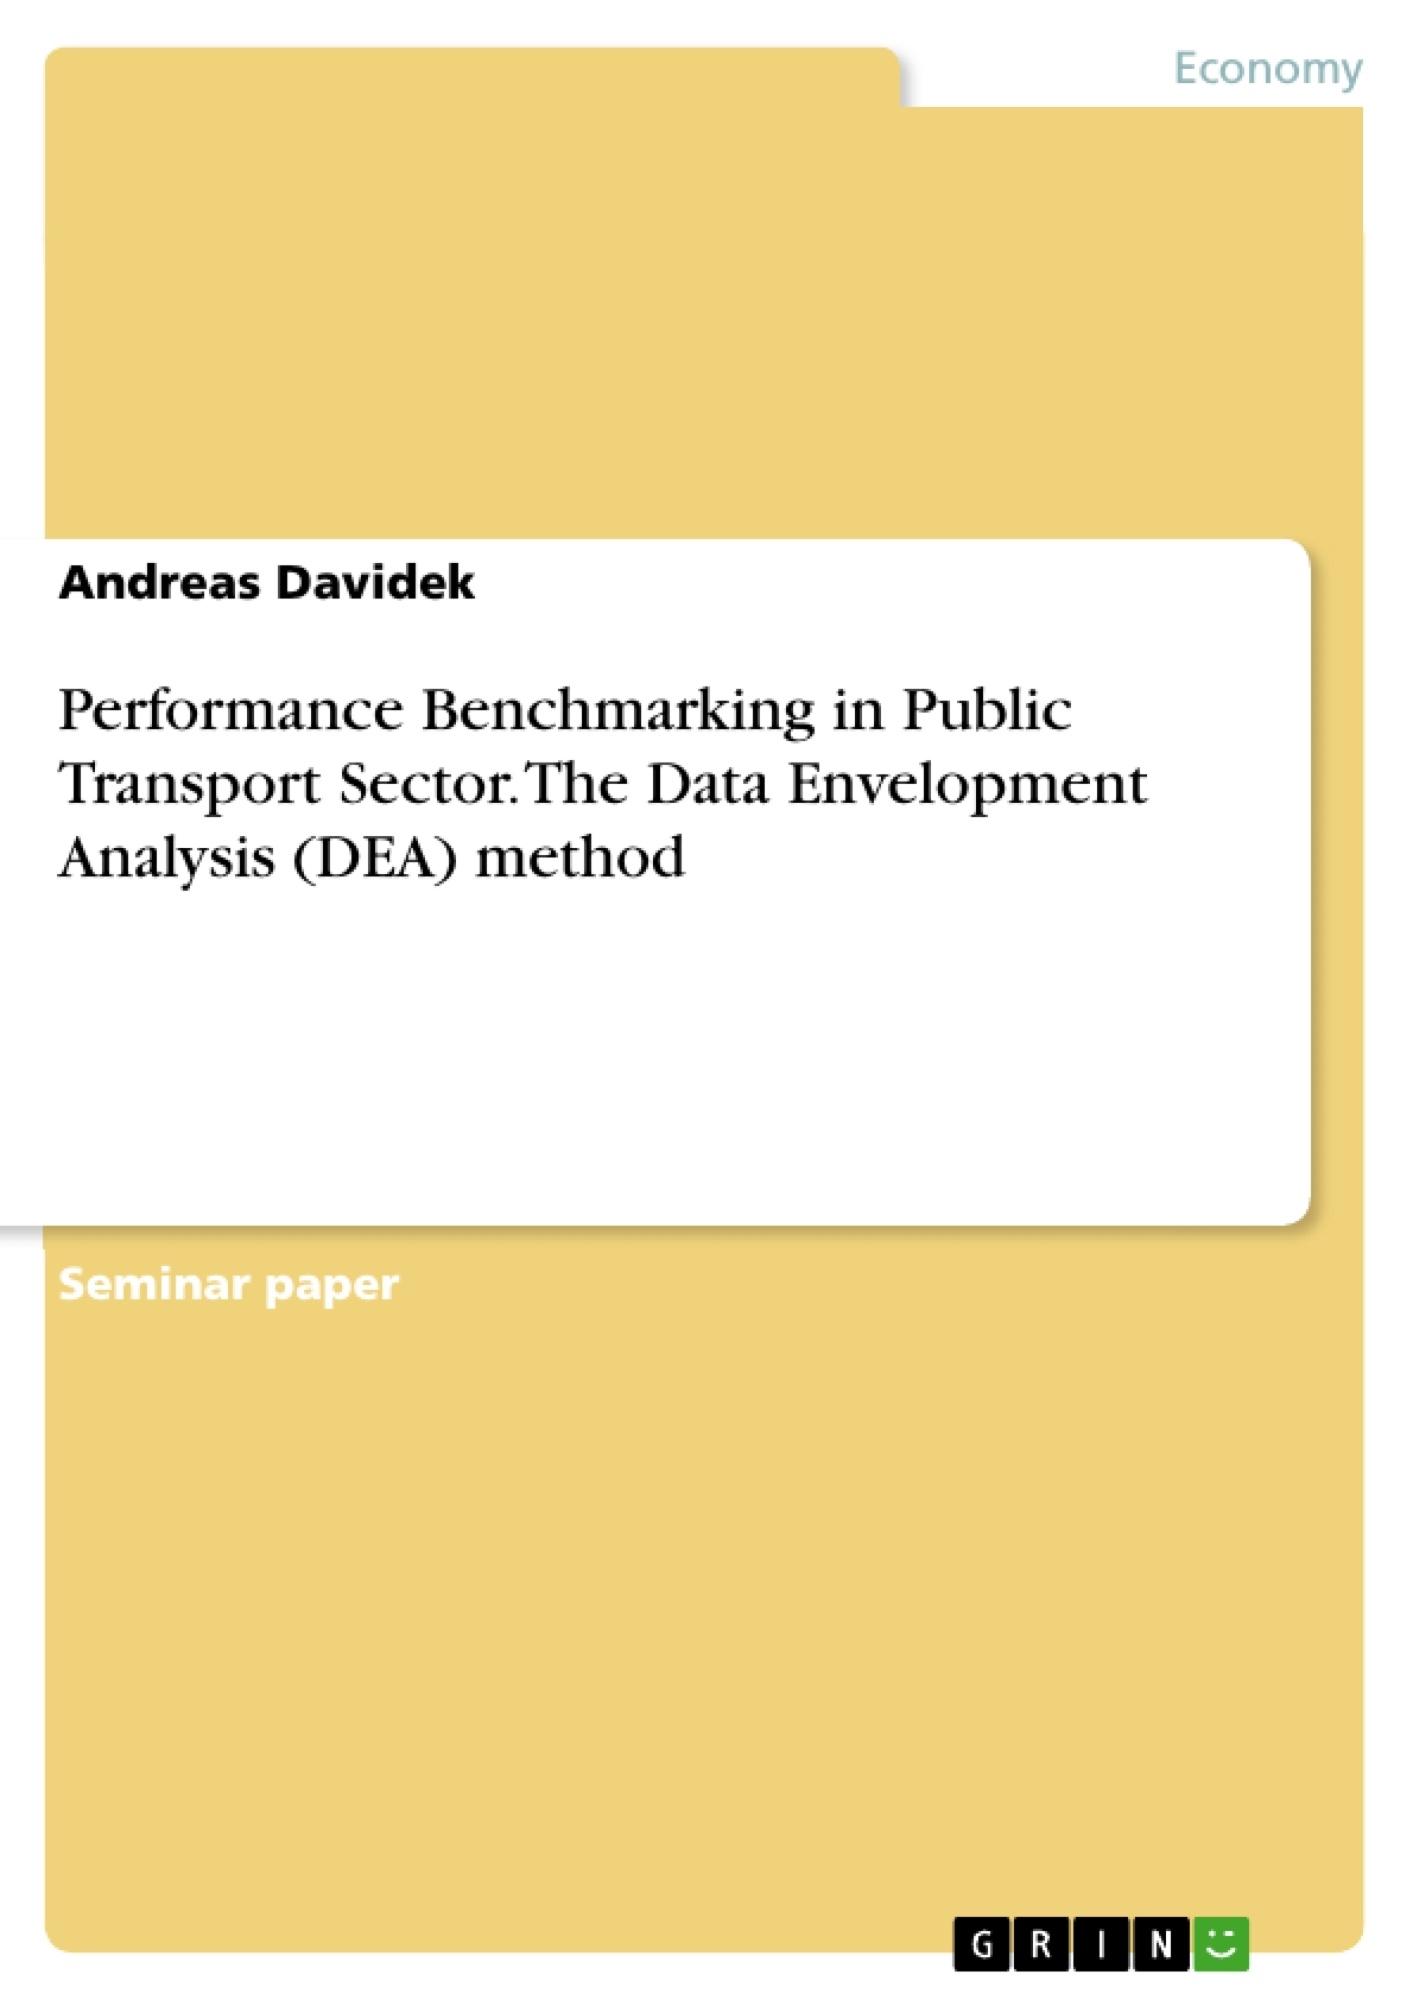 Title: Performance Benchmarking in Public Transport Sector. The Data Envelopment Analysis (DEA) method